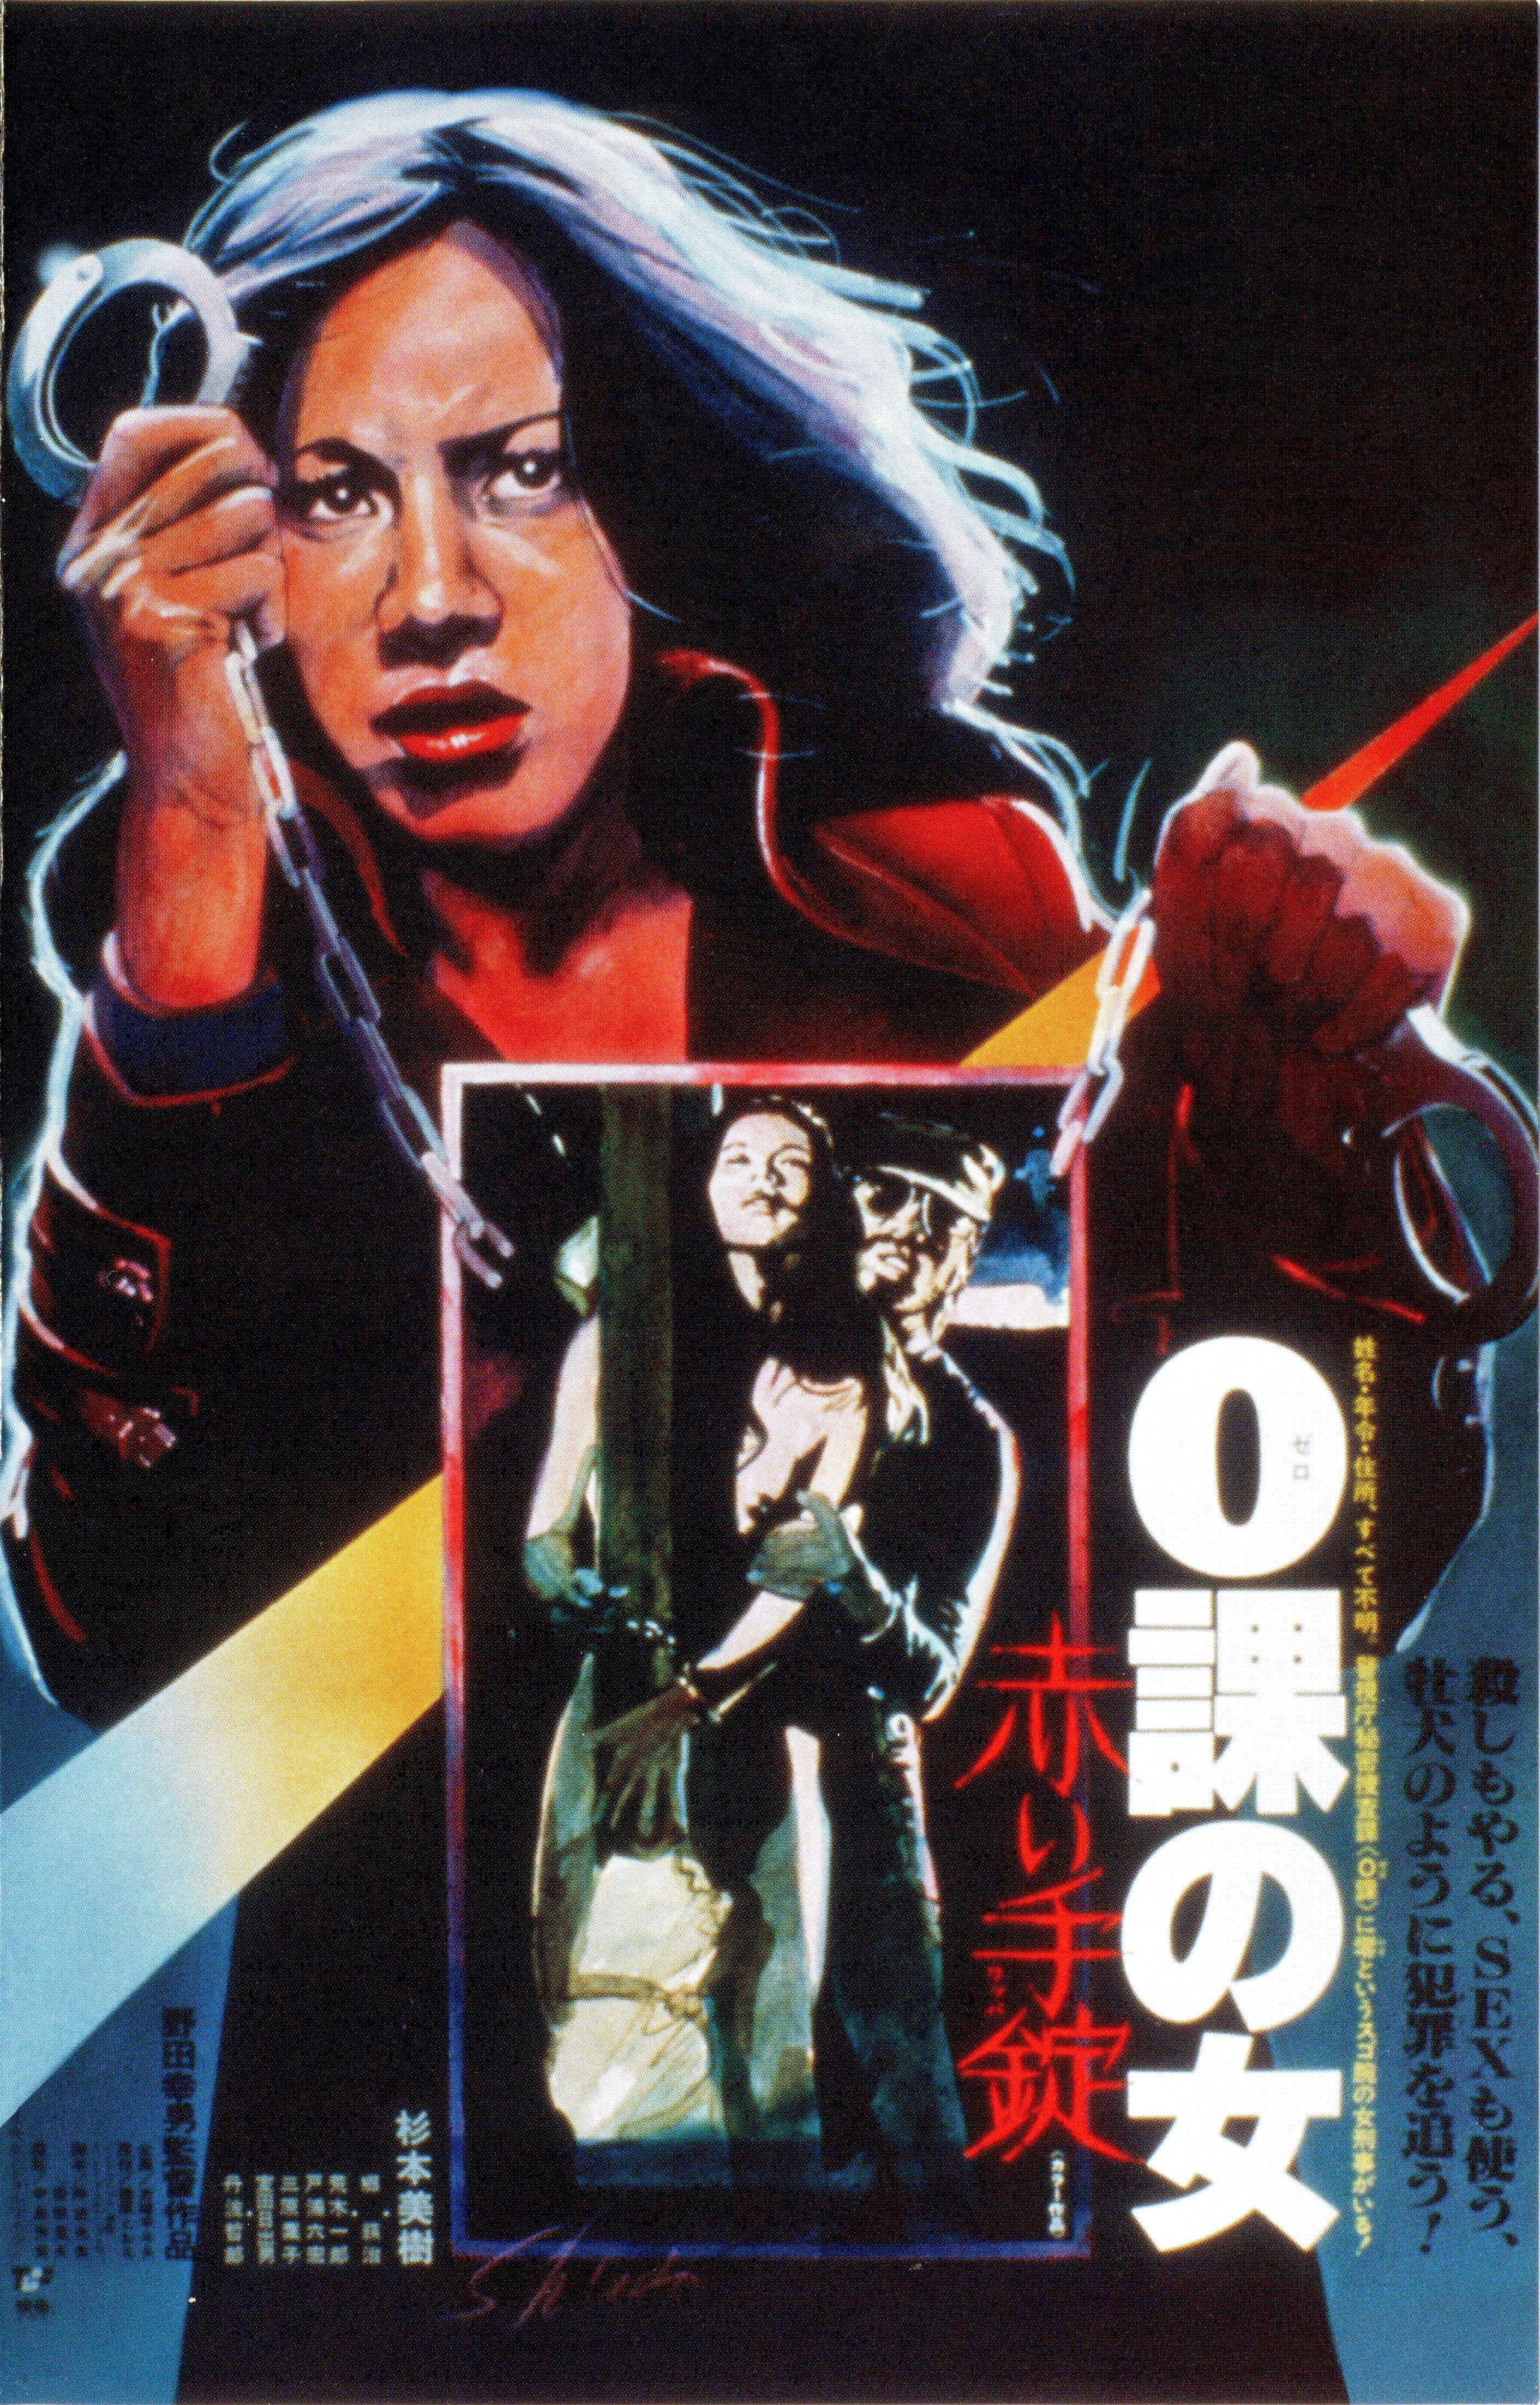 zero_woman_red_handcuffs_poster_01.jpg